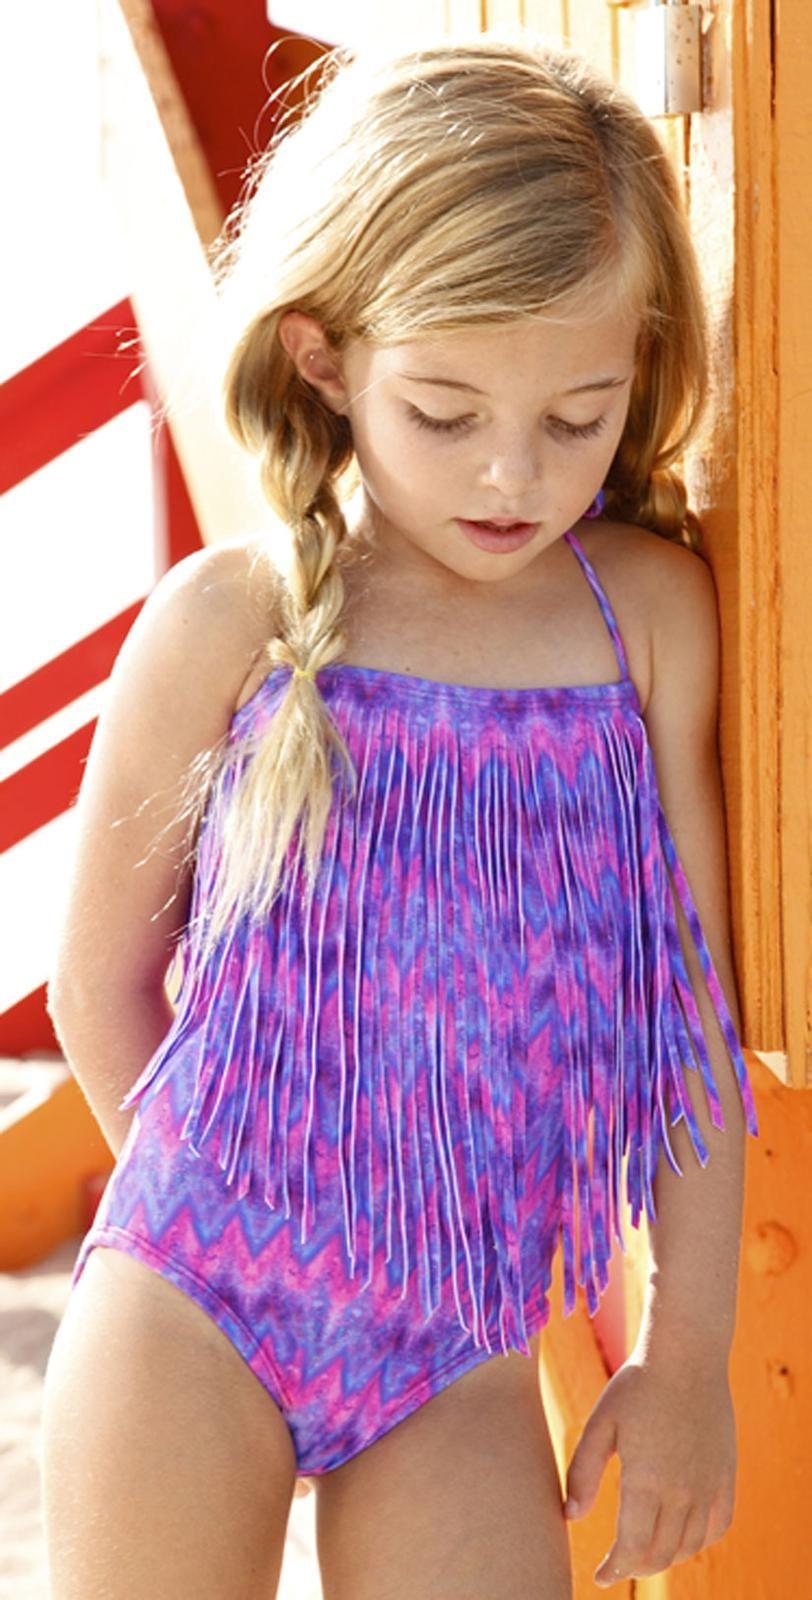 Peixoto Kids Berry Zilggy Magnolia Swimsuit 51603-P38 ...